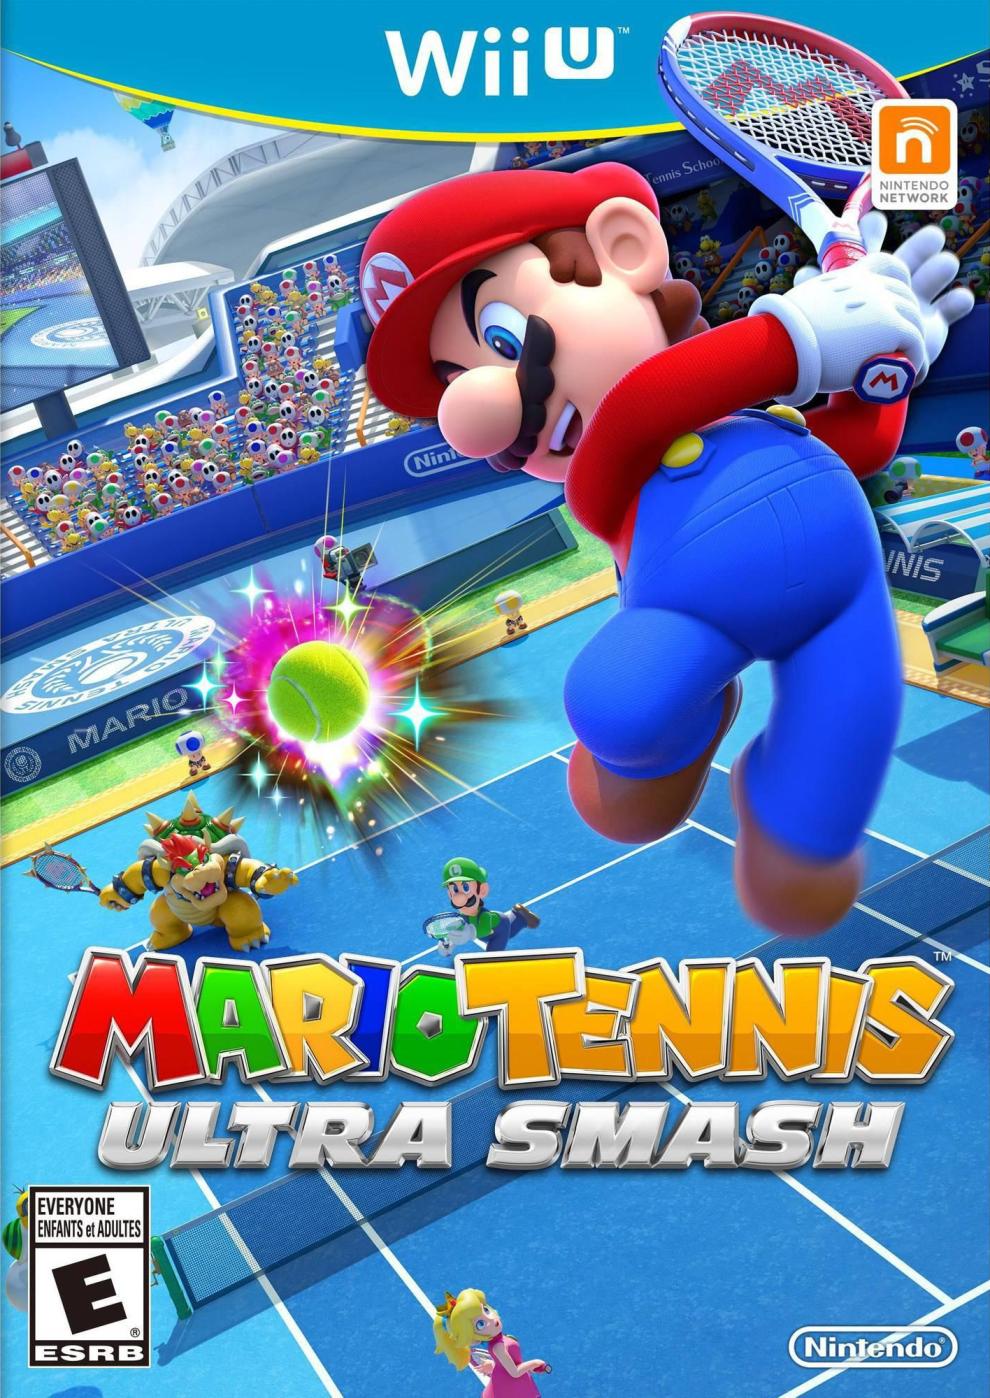 Mario Tennis Ultra Smash Us Box Art Nintendo Box Art Pinterest